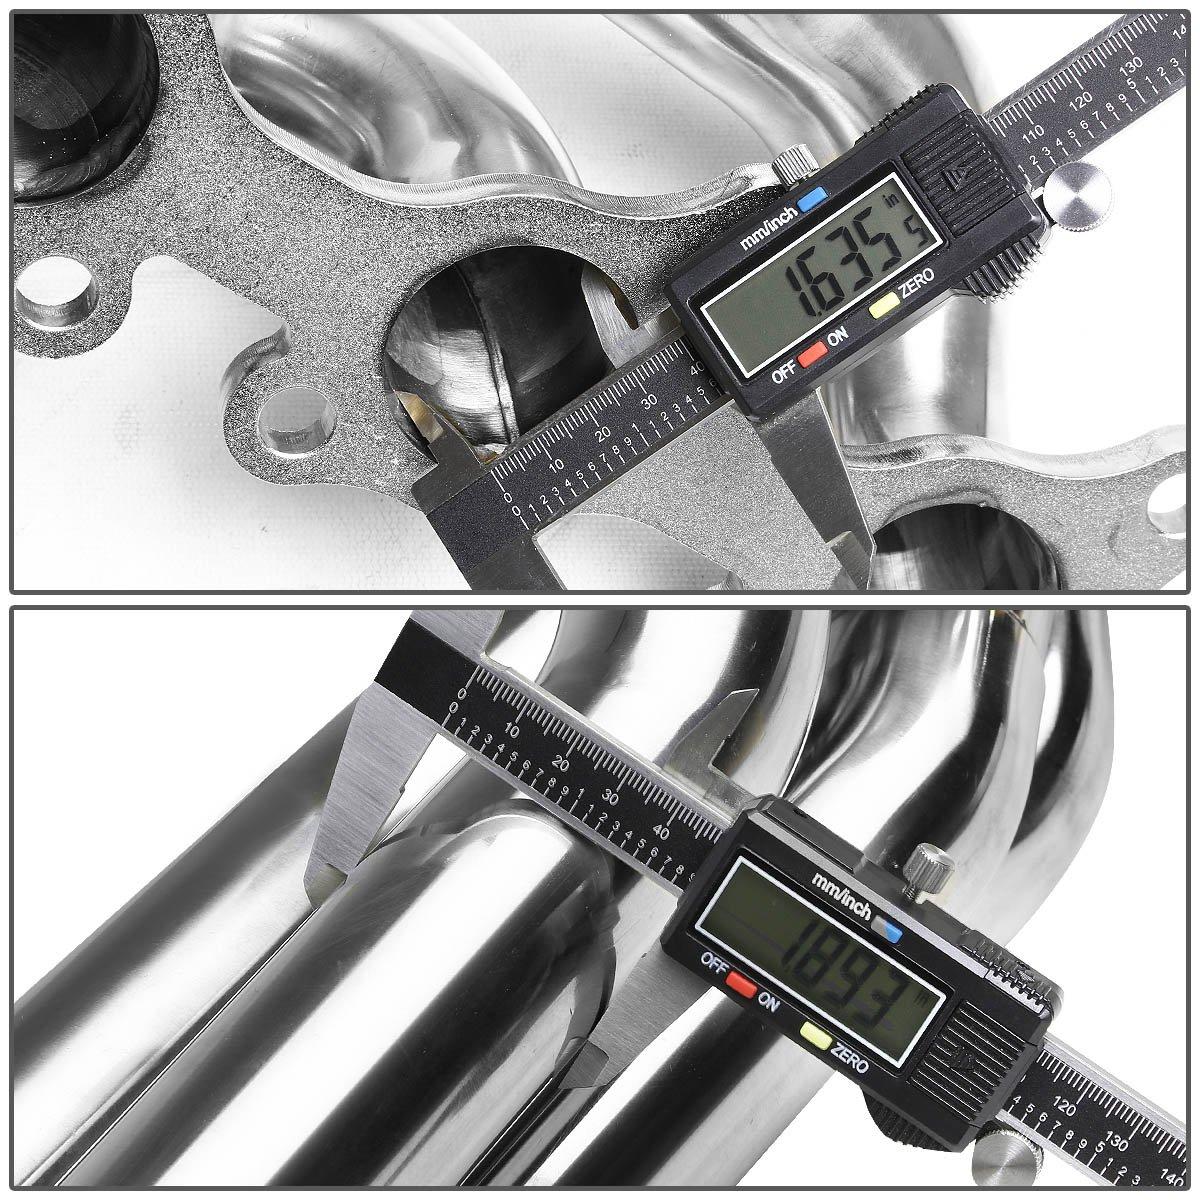 DNA Motoring HDS-FM11-LT Stainless Steel Exhaust Header Manifold